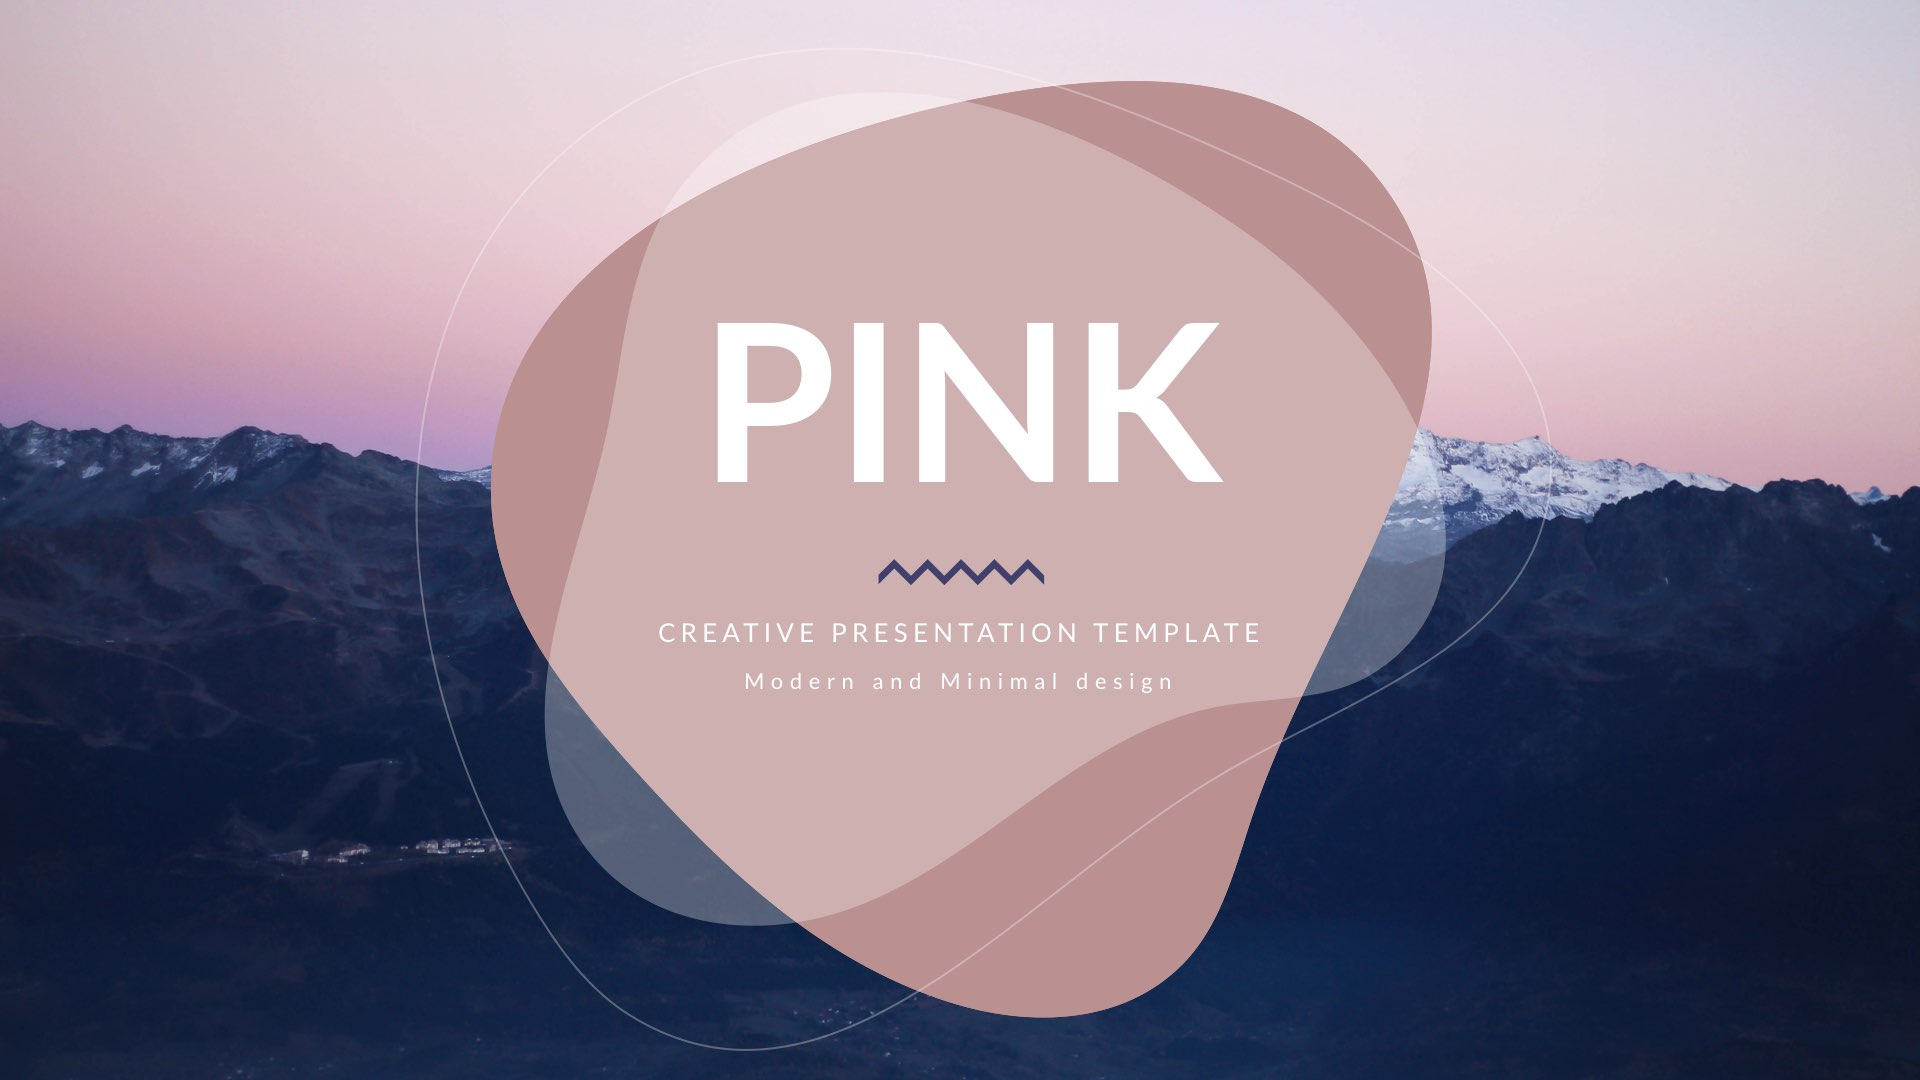 33 - Pink Minimal Creative Keynote Template